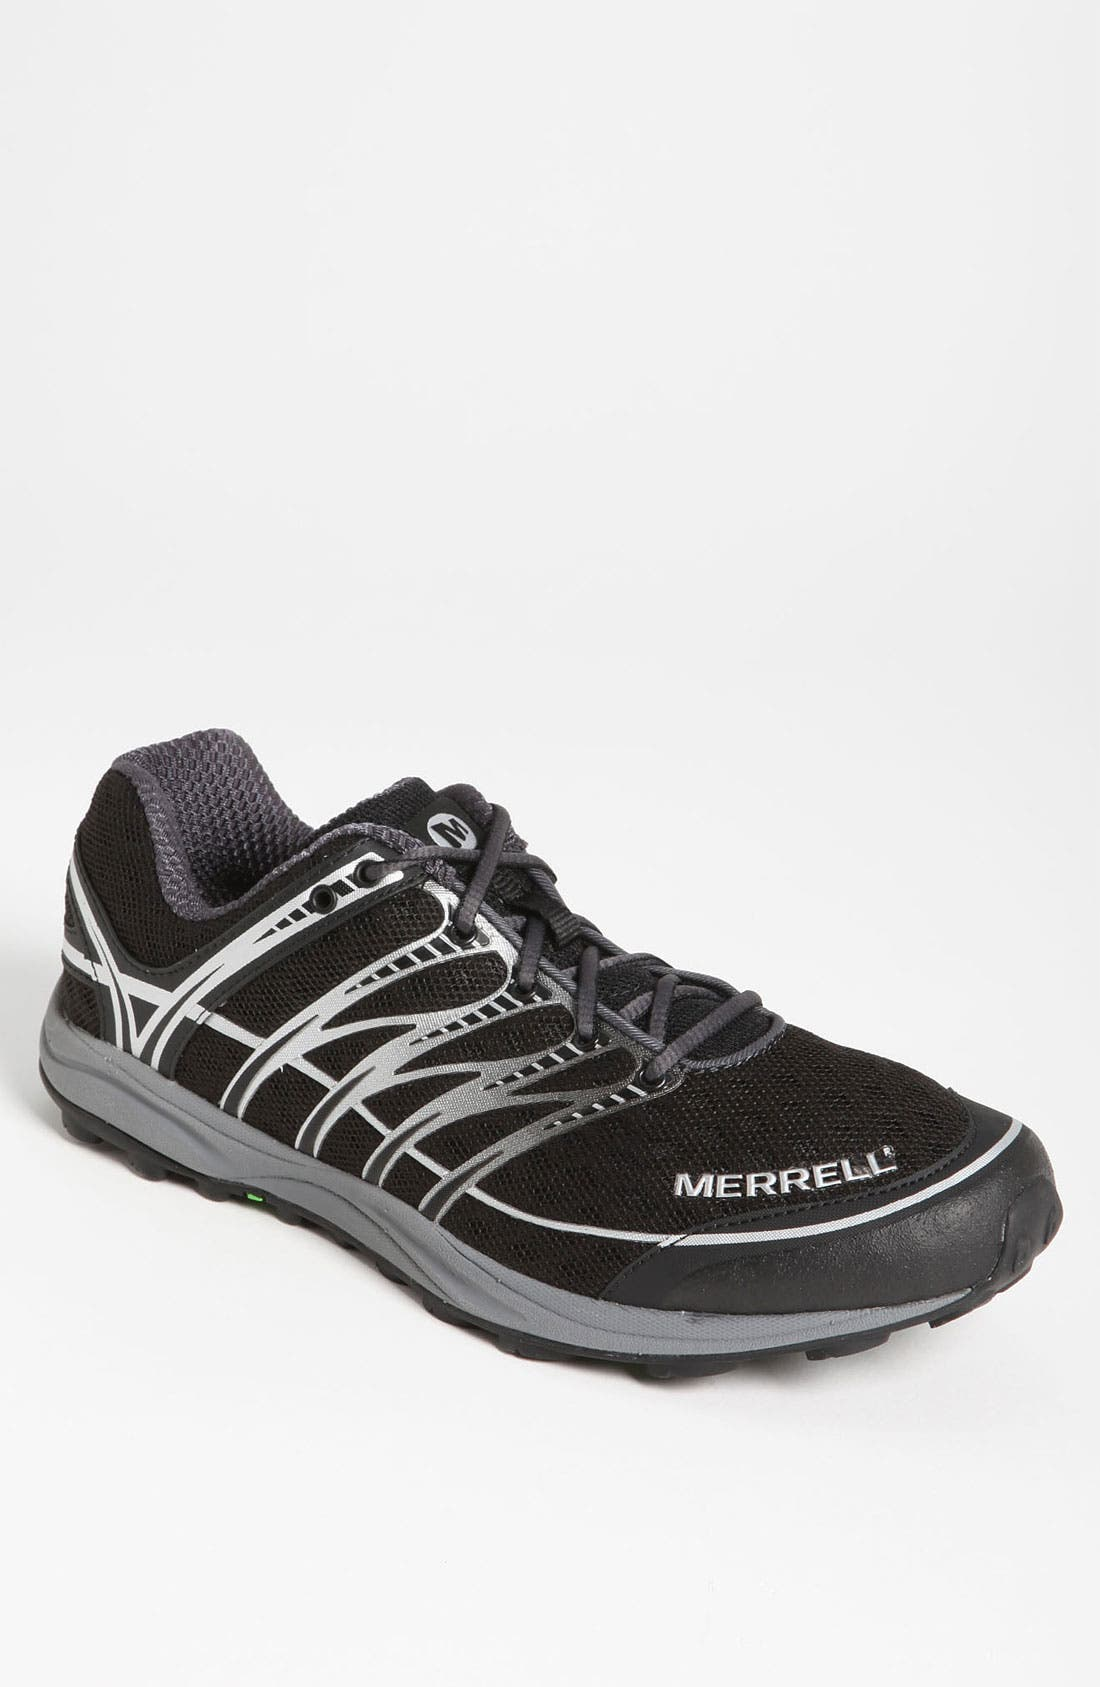 Main Image - Merrell 'Mix Master 2' Running Shoe (Men)